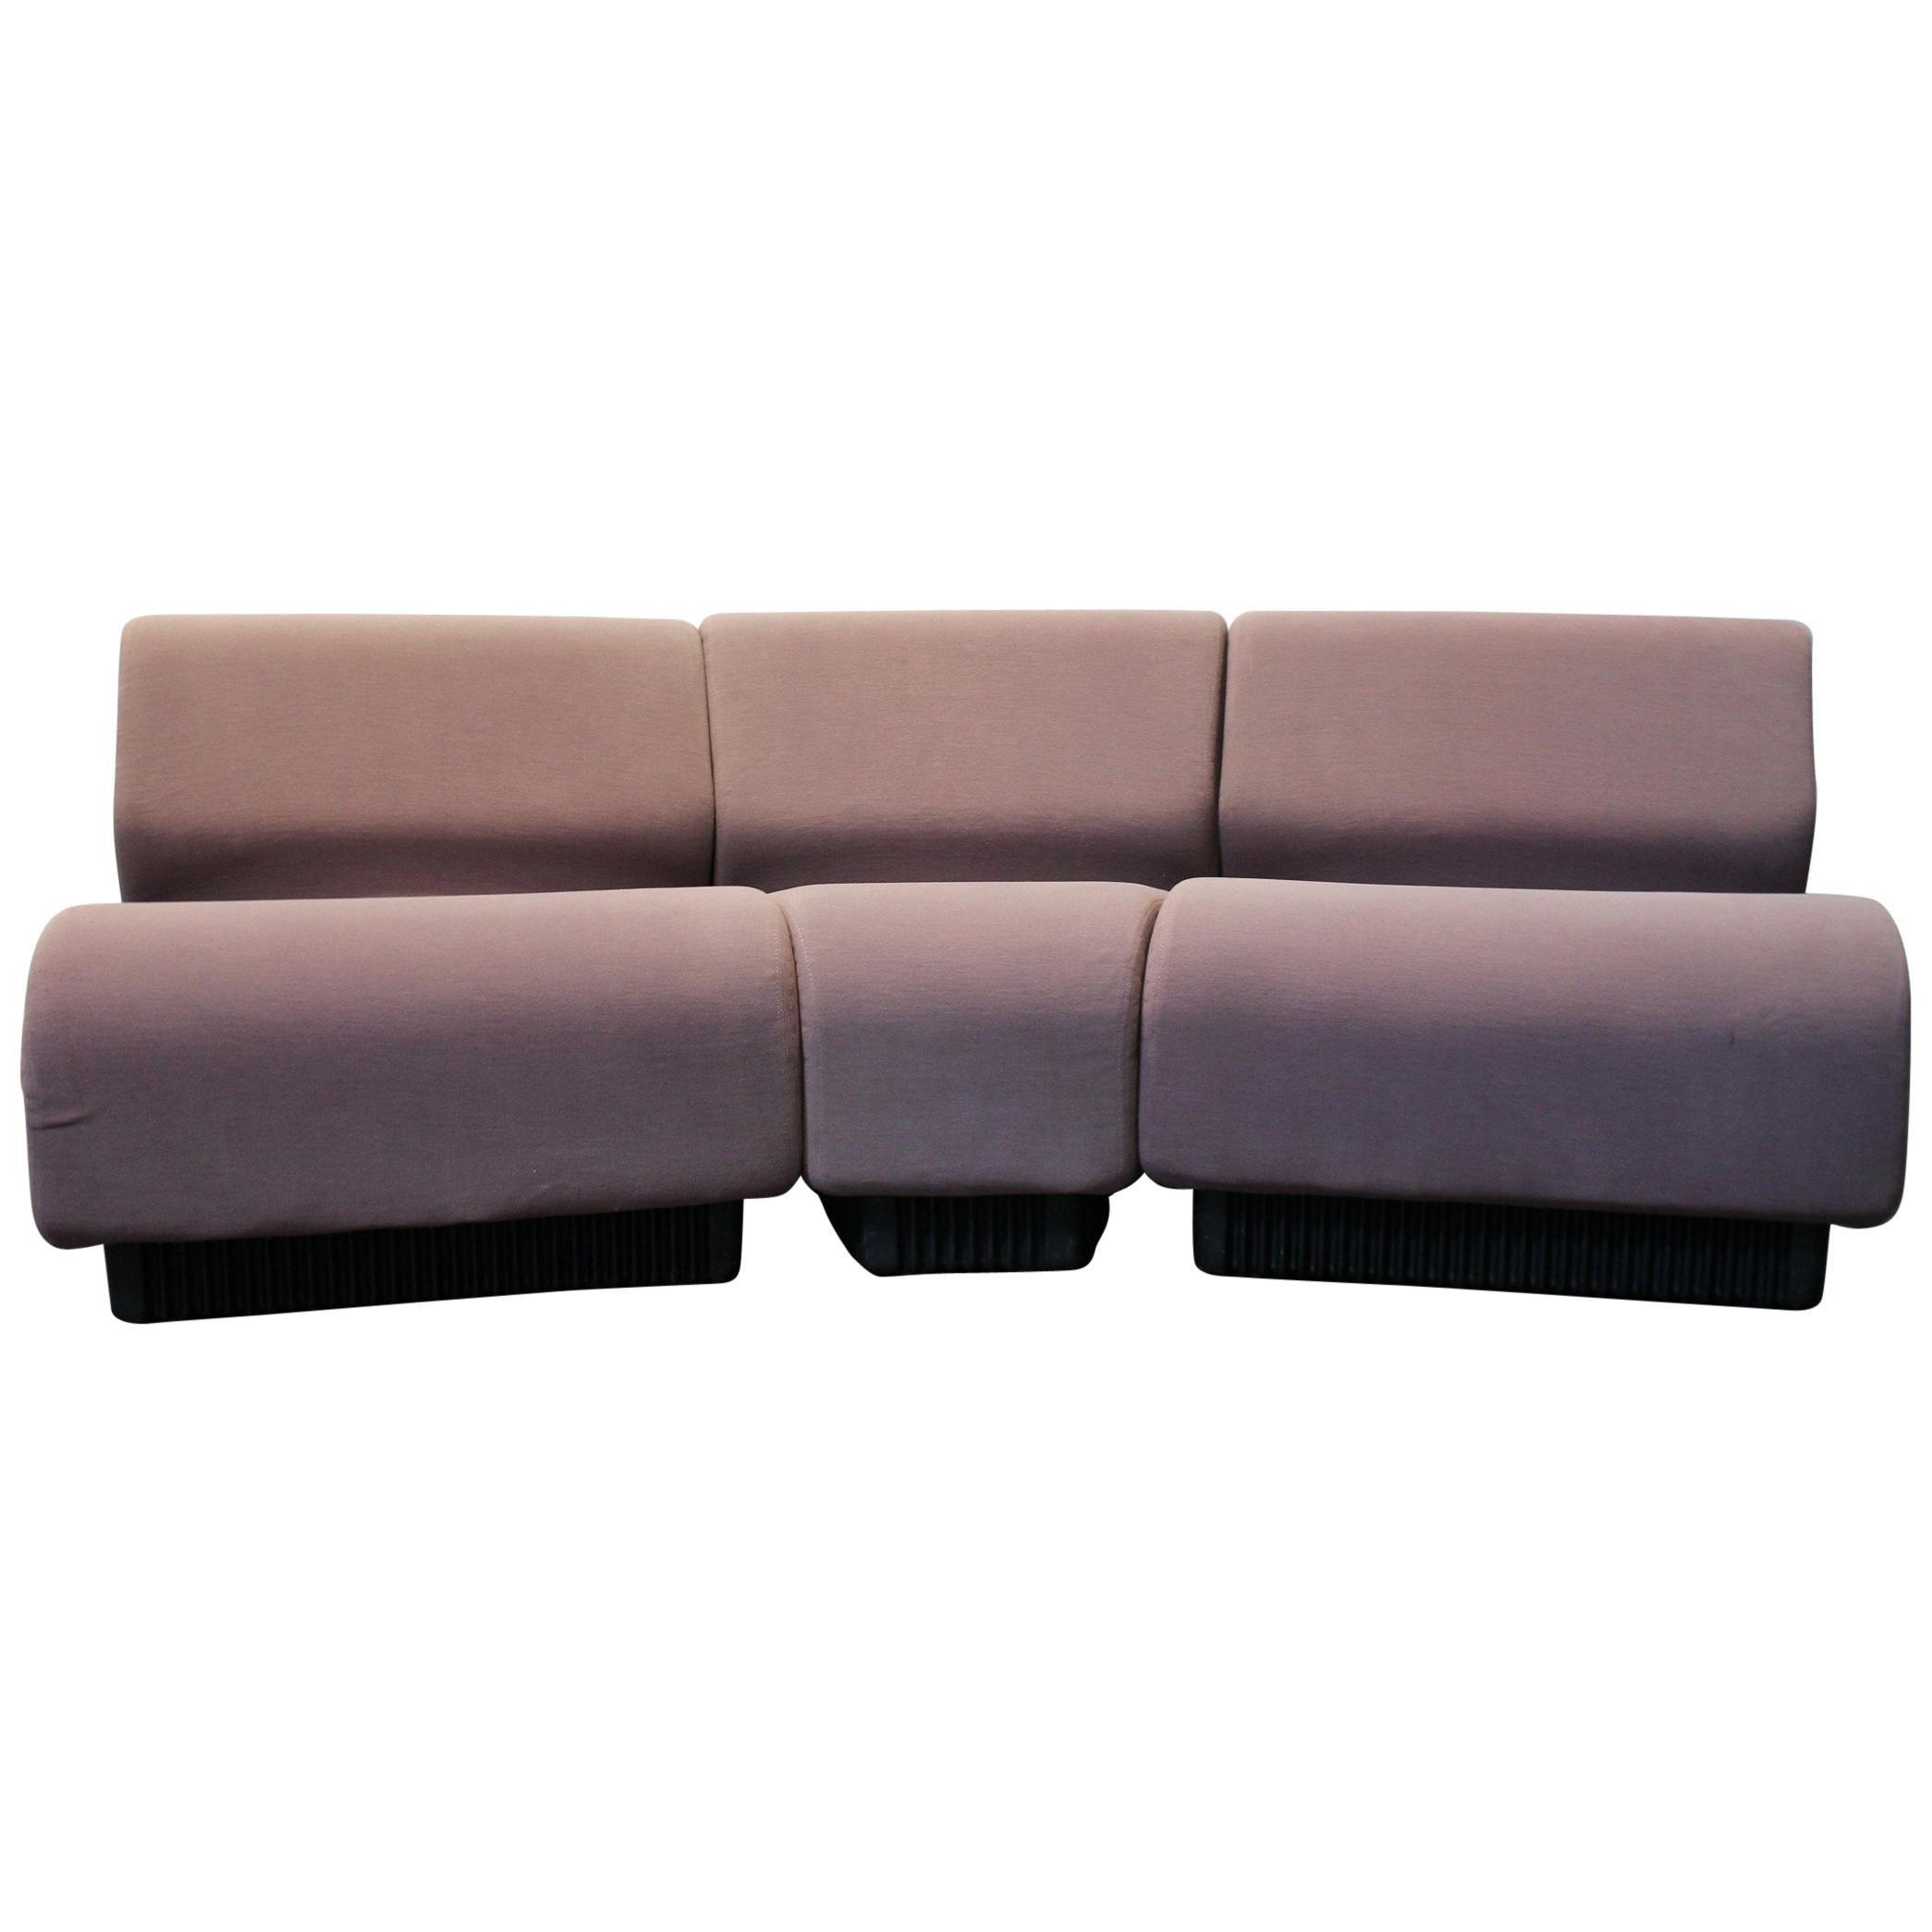 Modern Modular Settee Sofa By Don Chadwick For Herman Miller